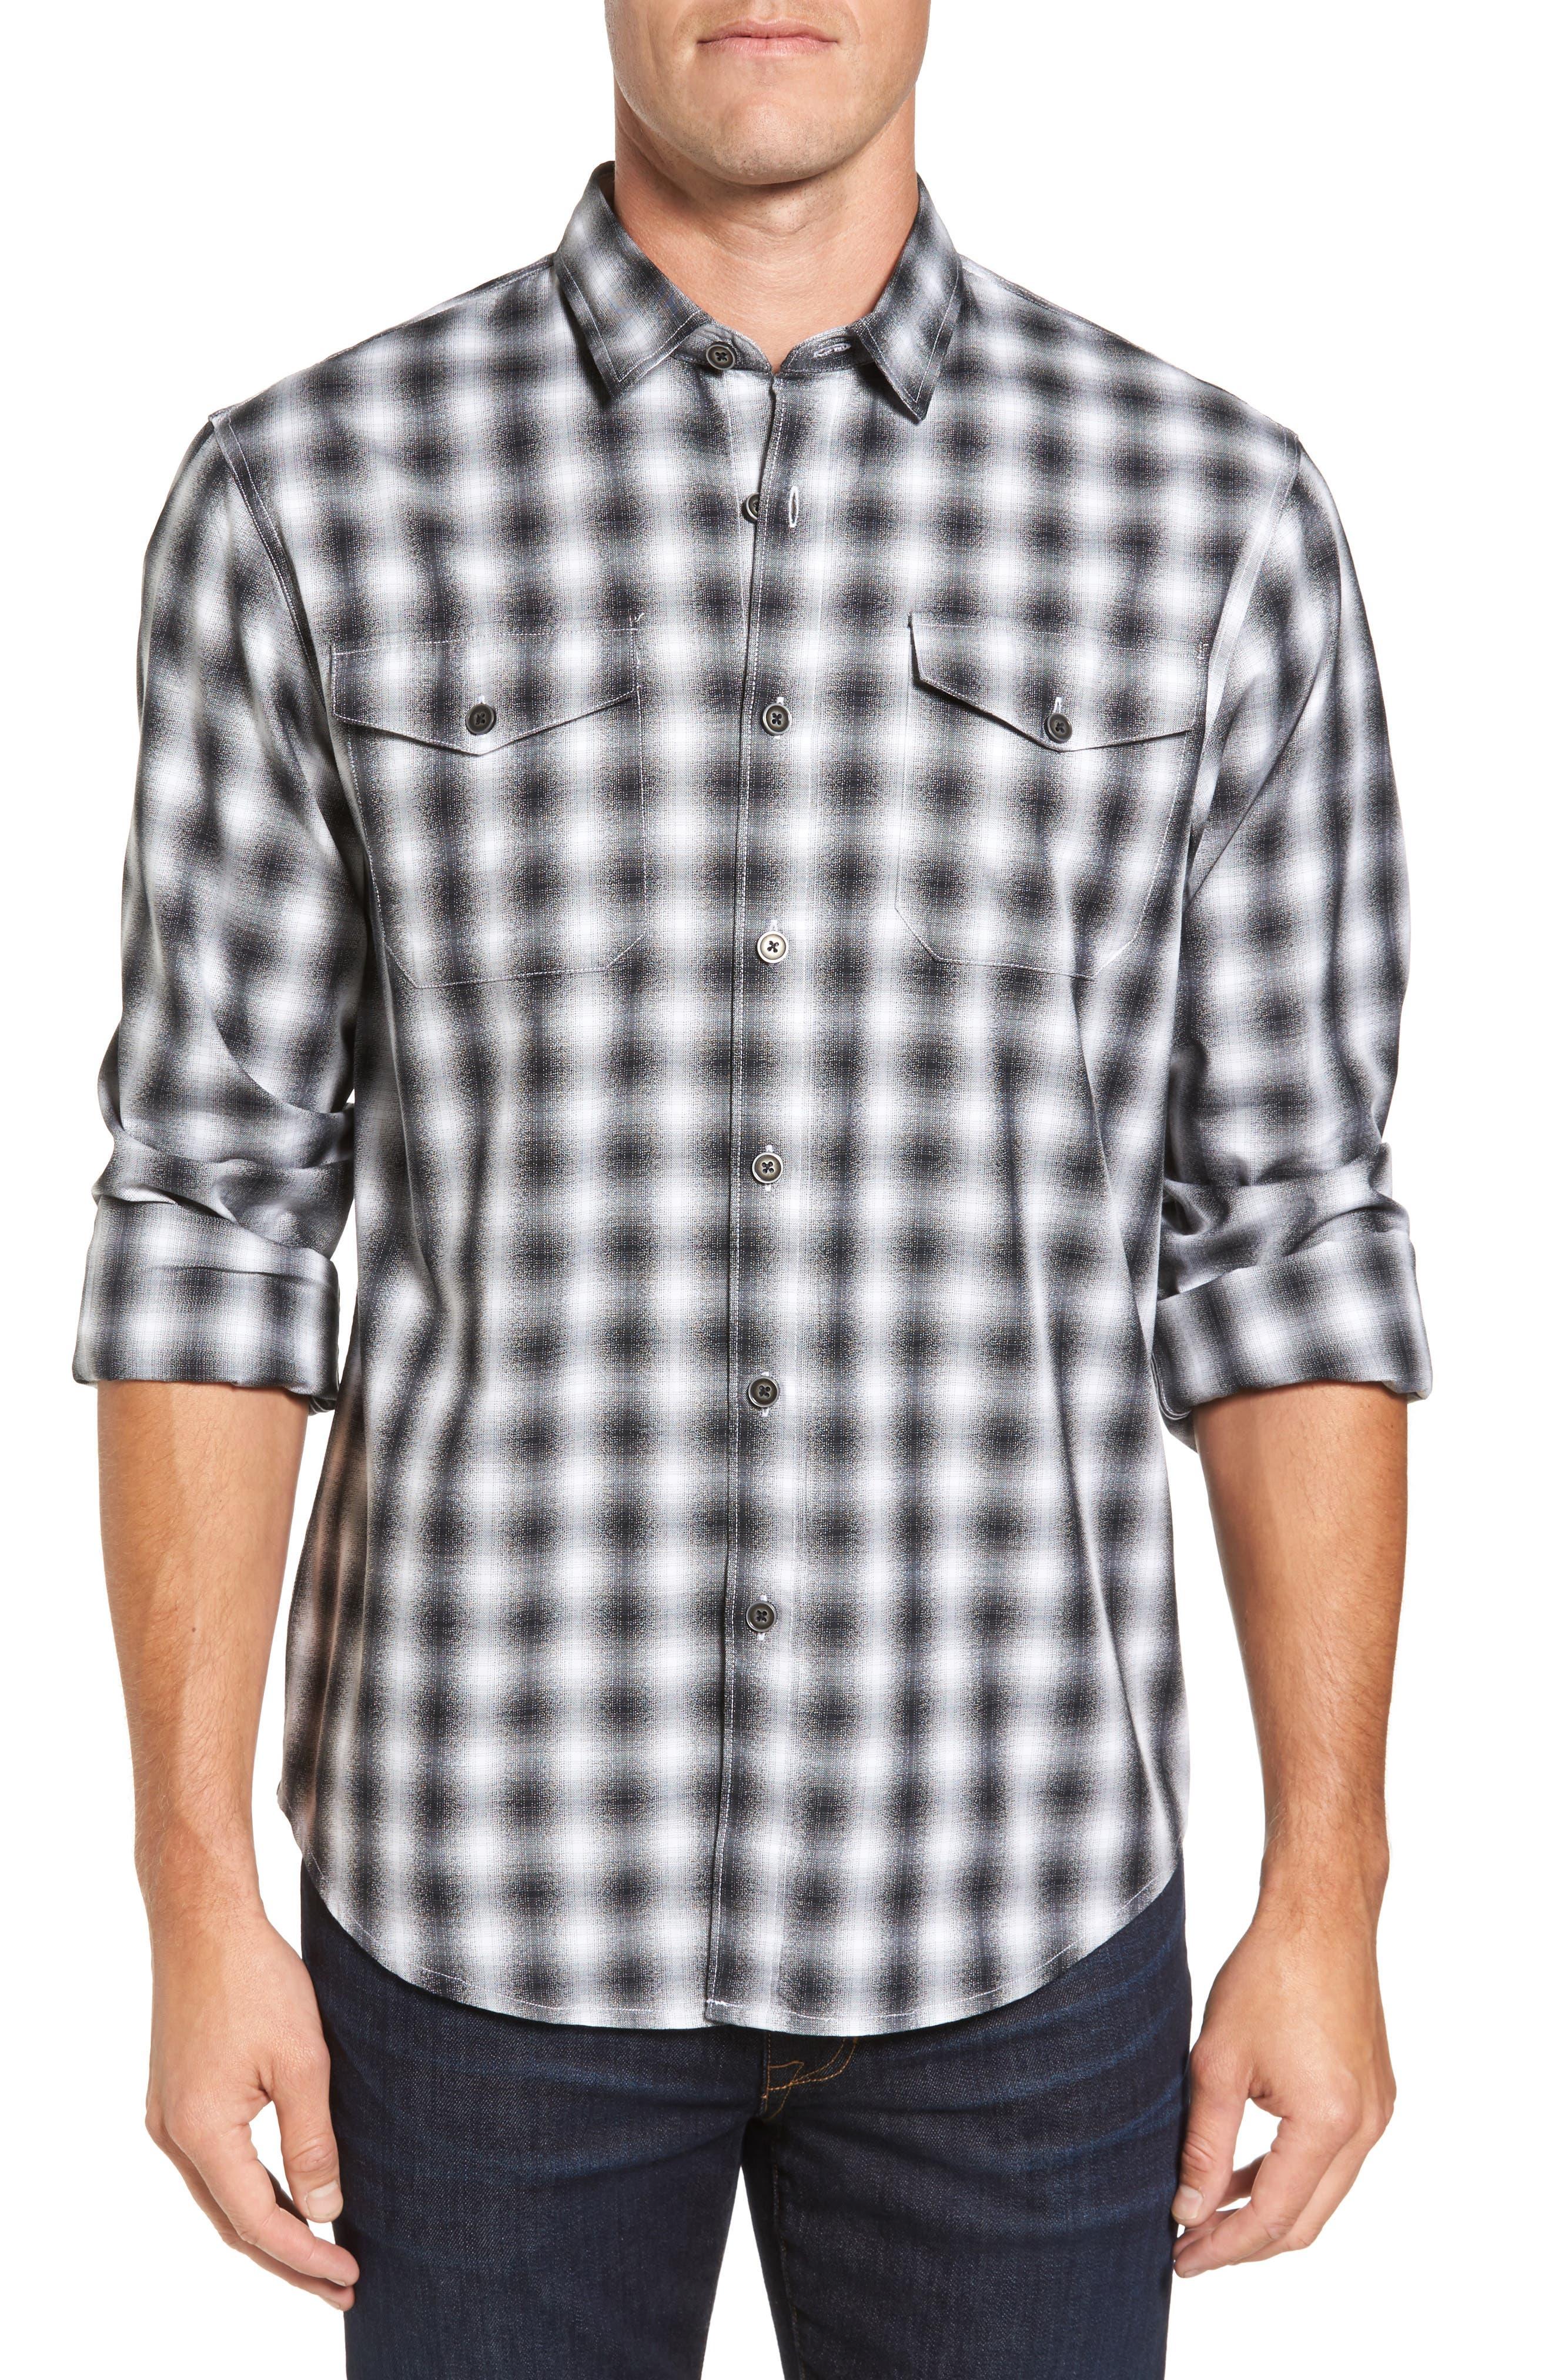 Coastaoro Acacia Regular Fit Plaid Flannel Shirt